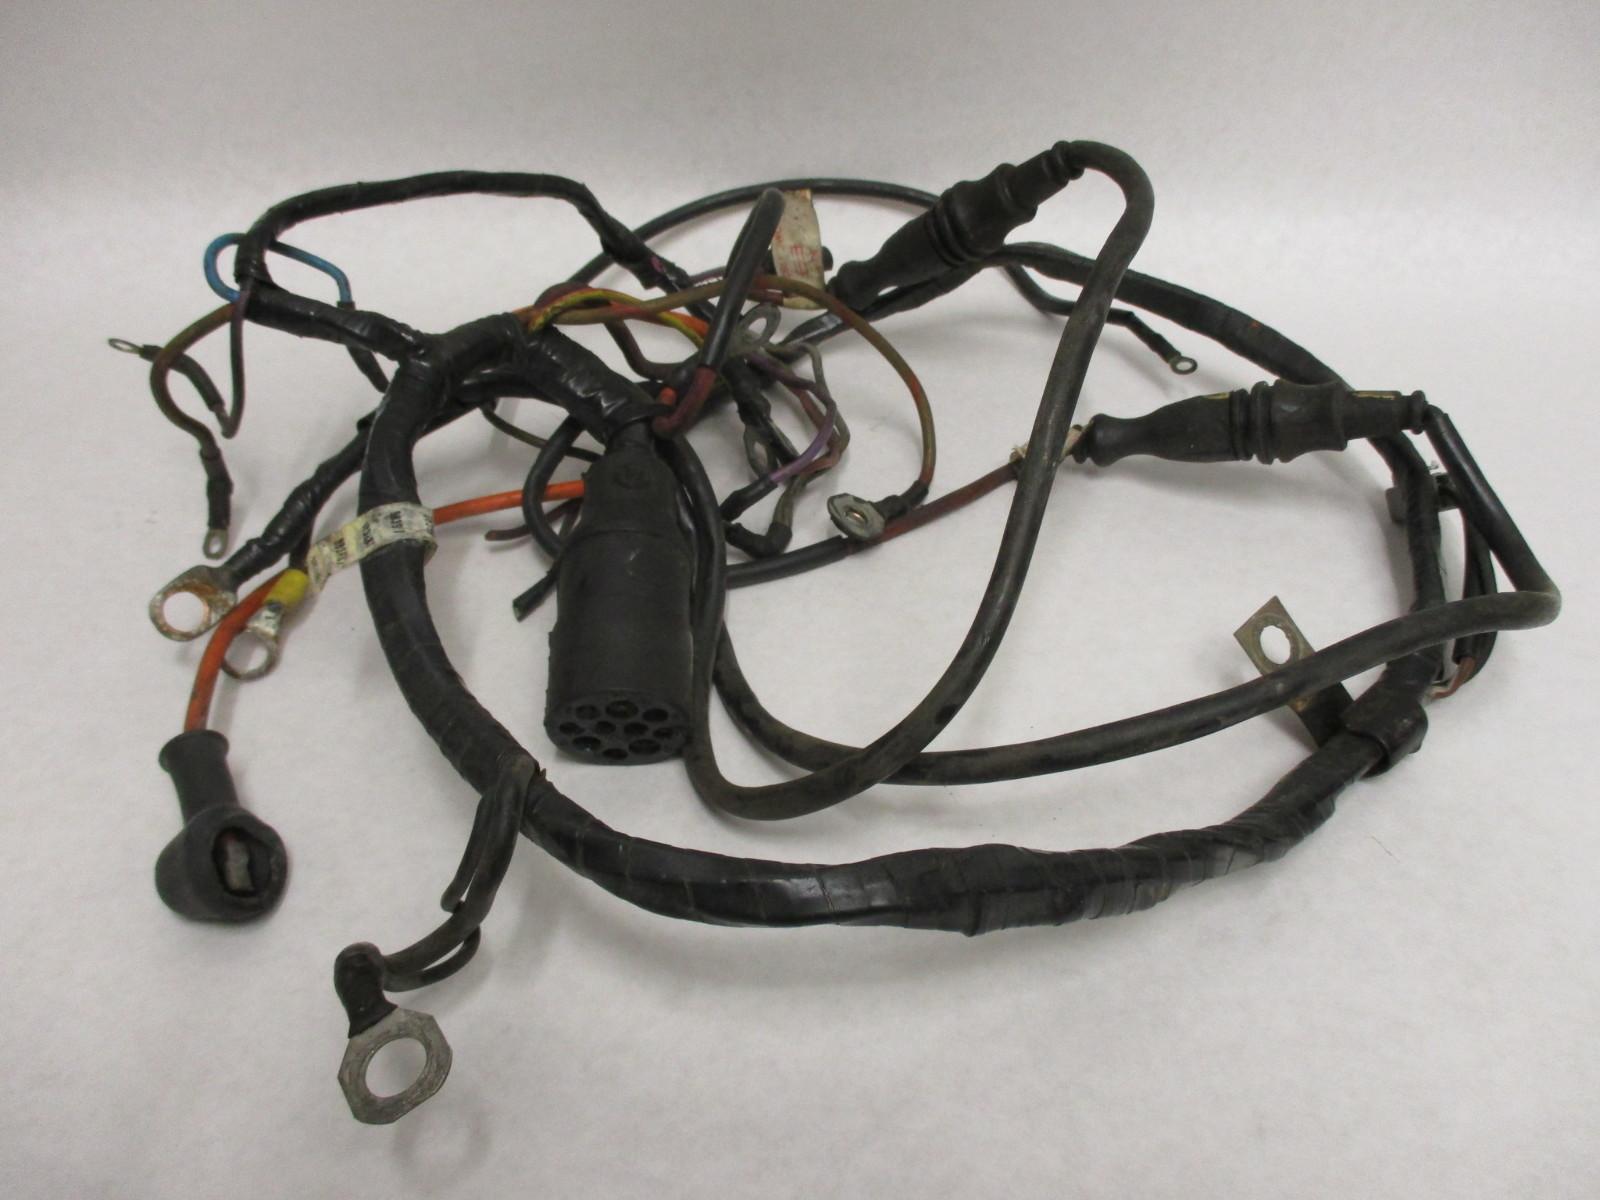 0985035 omc cobra chevy 3 0 4 cyl engine wire harness 1987 green bay propeller marine llc